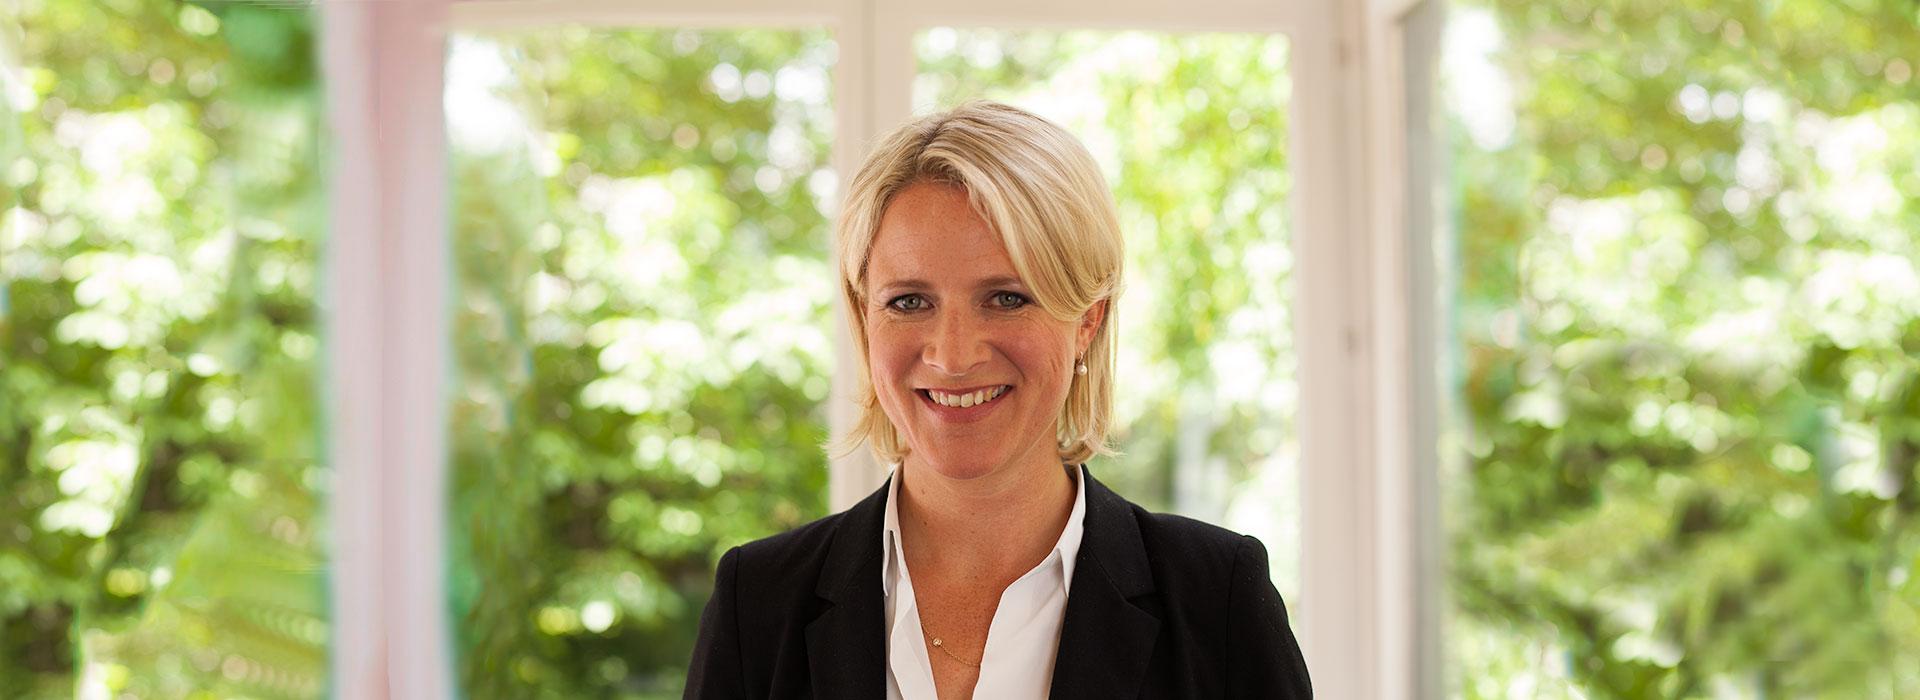 Juliane Freifrau von Kottwitz